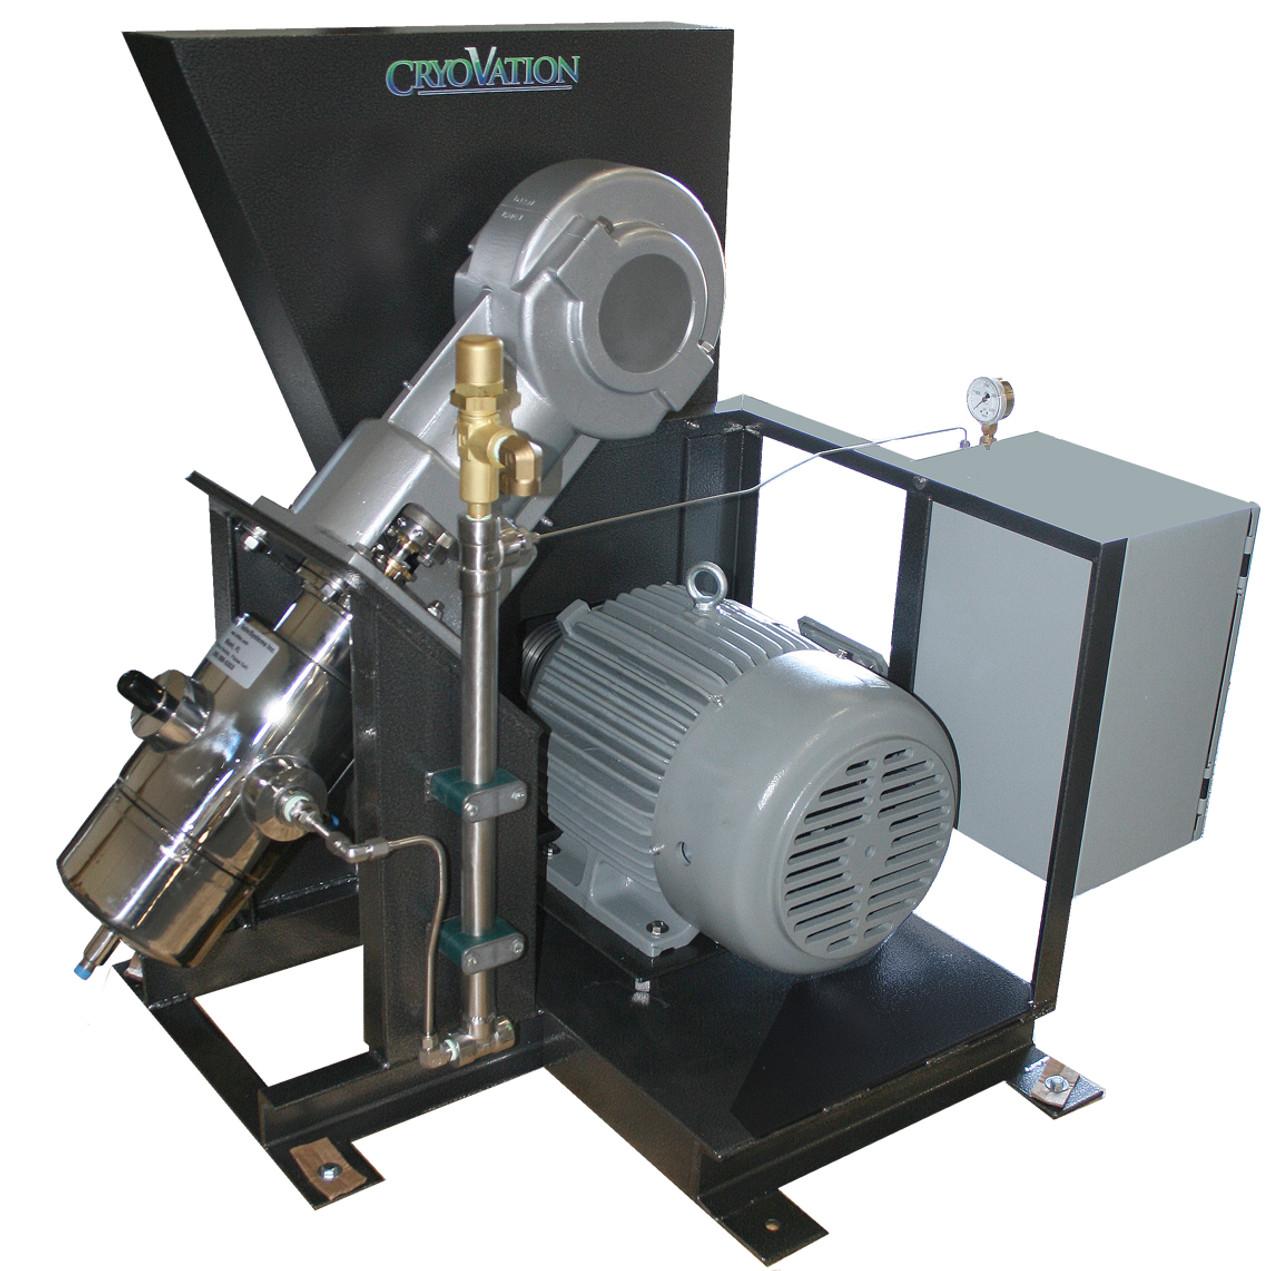 CV P1600 Cryogenic Filling Pump - Refurbished